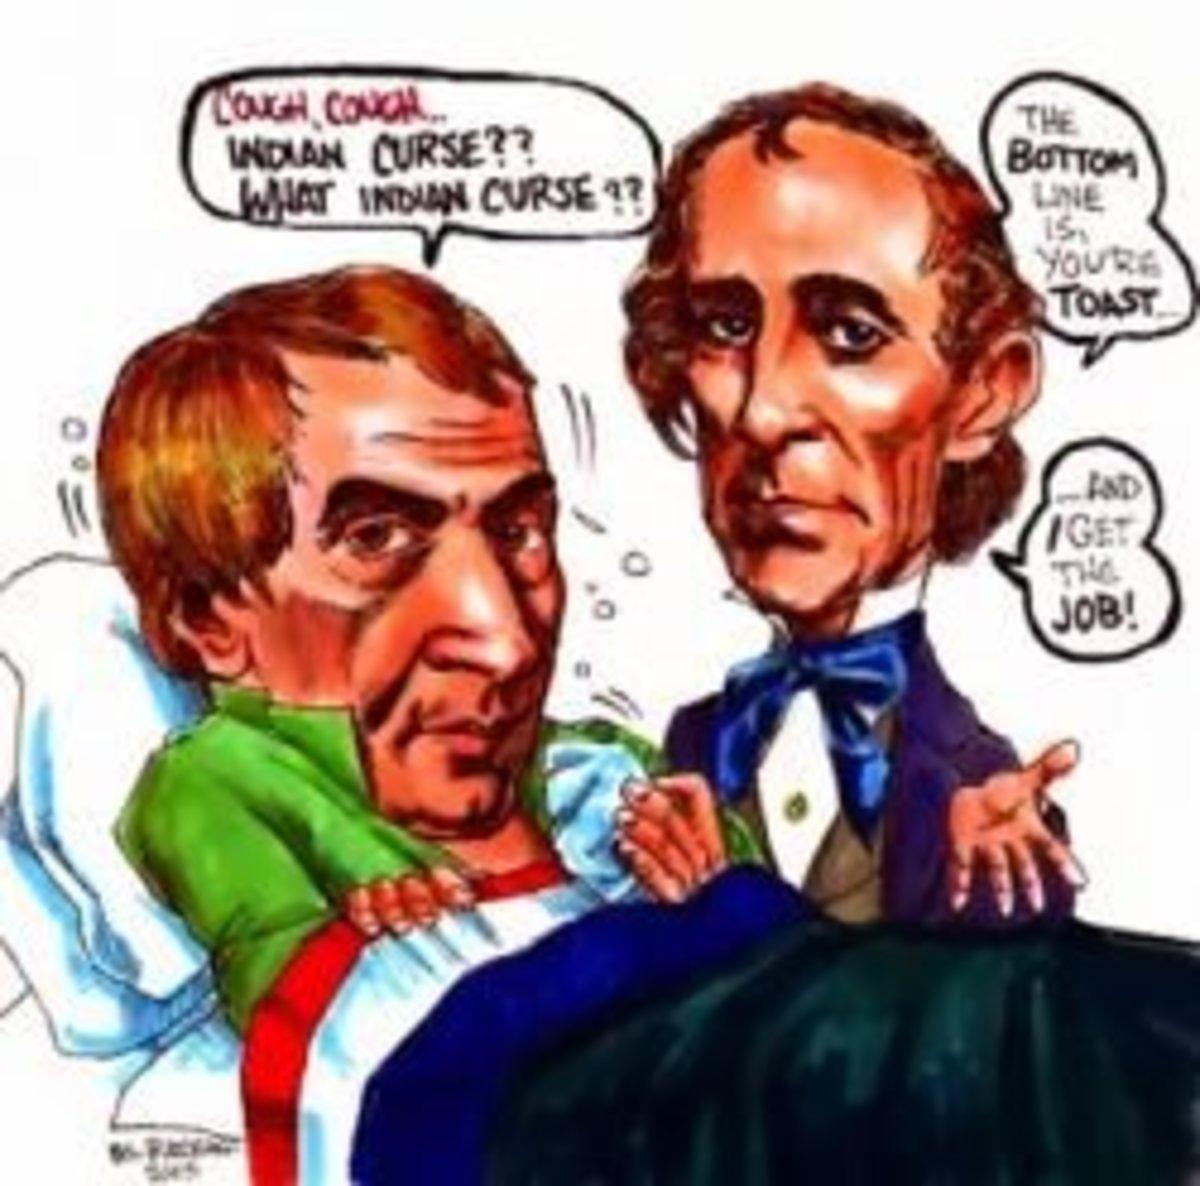 Image Credit to http://cariart.tripod.com/cartoon-3.html